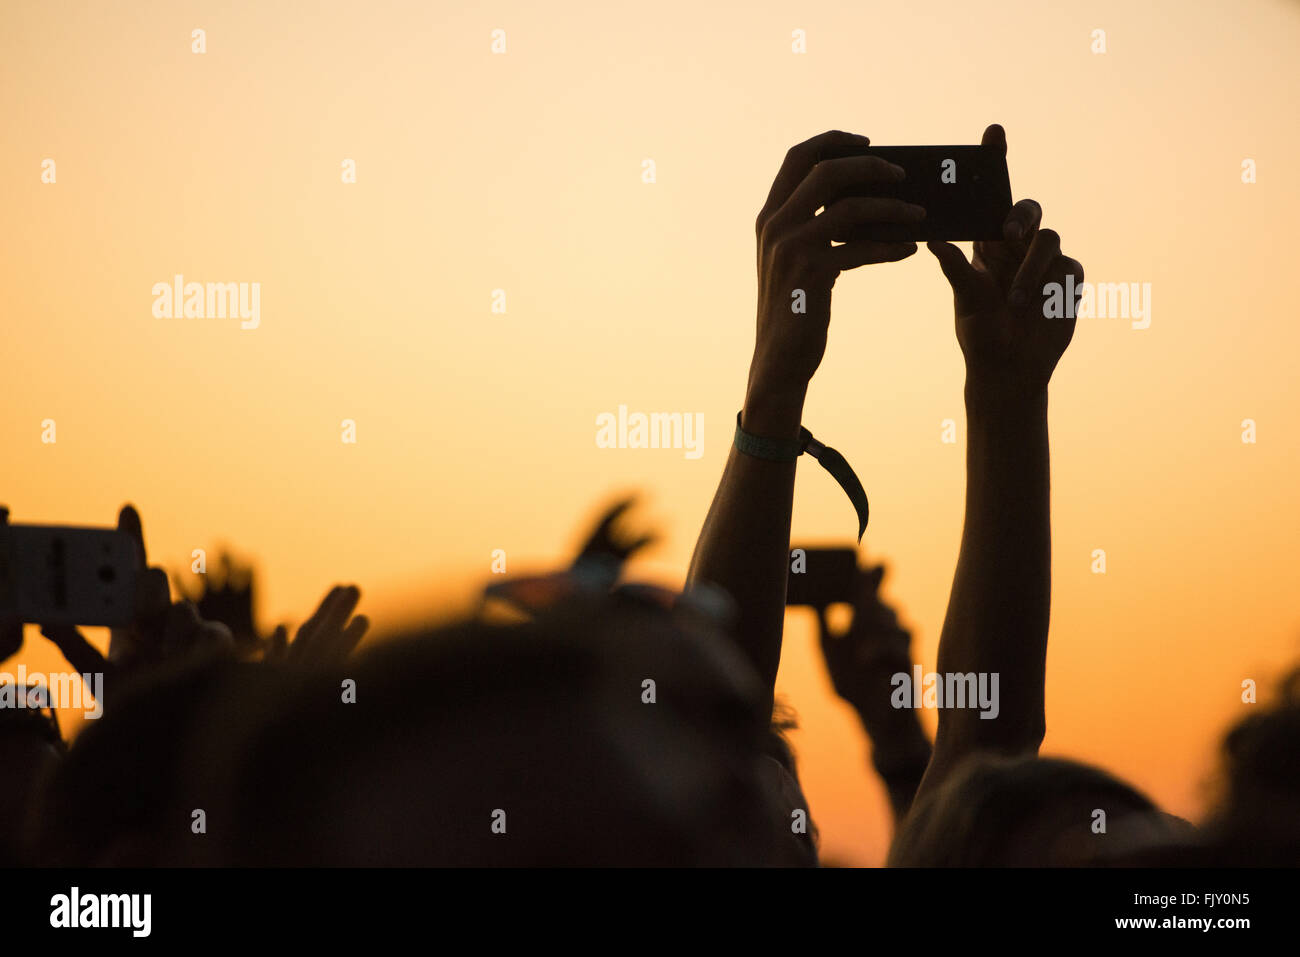 Beschnitten, Hände fotografieren durch Smartphones während Musikfestival Stockbild